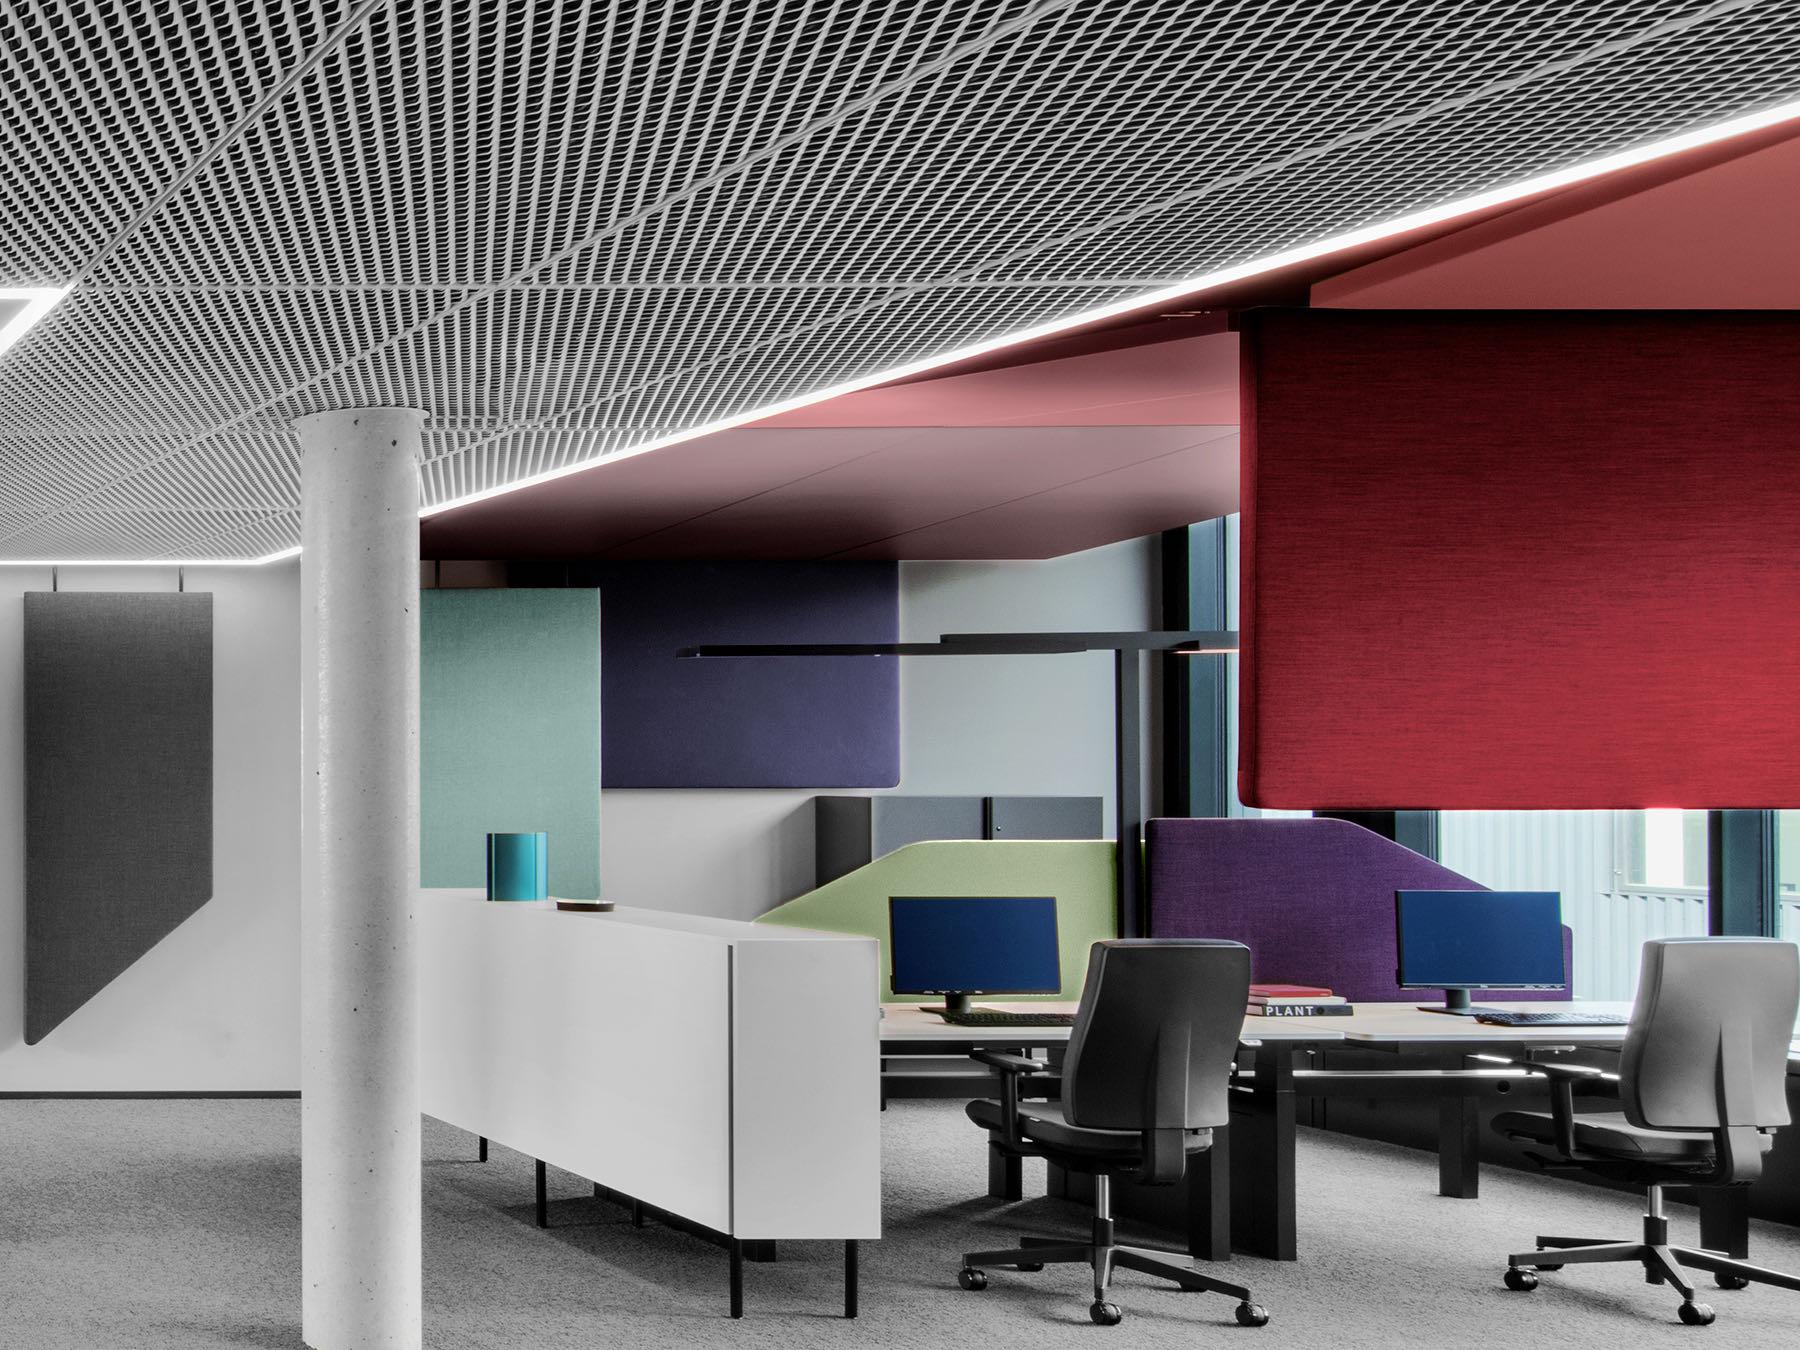 woerwag-stuttgart-office-9